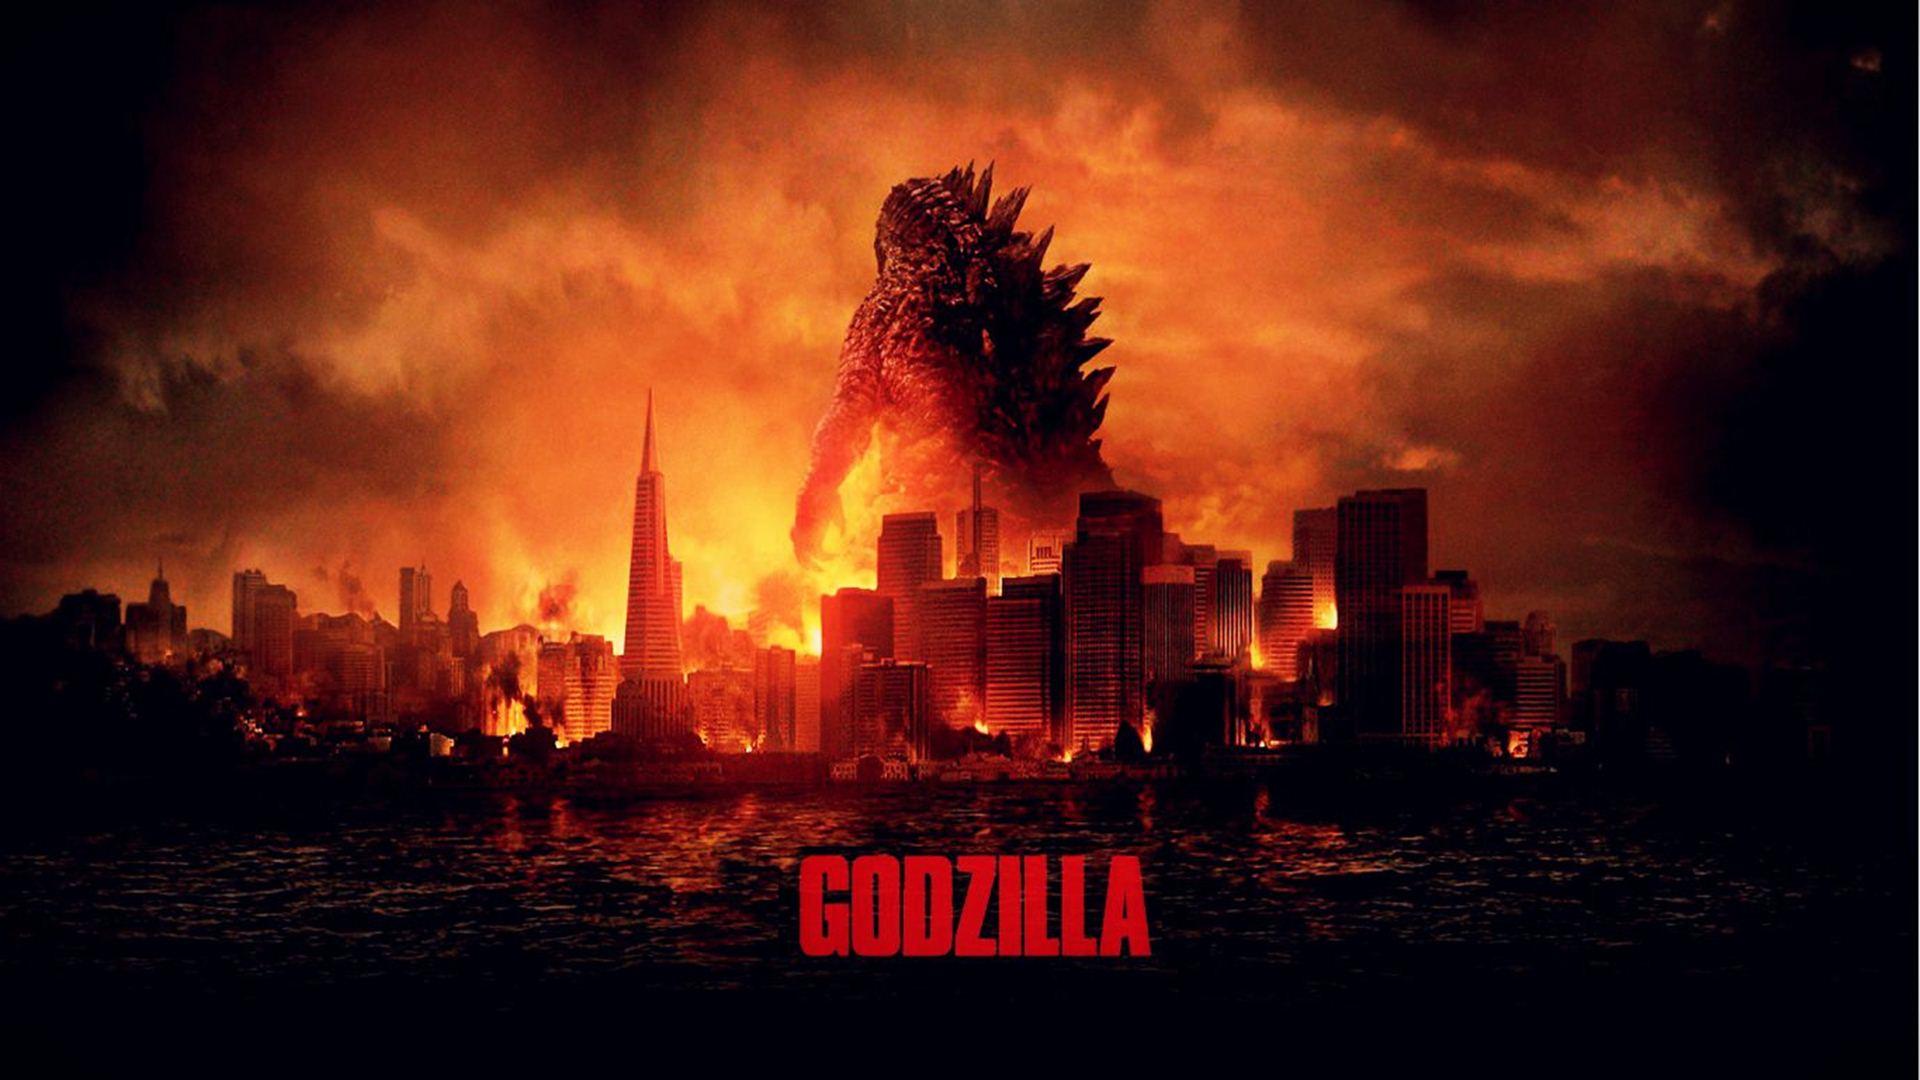 Godzilla Wallpapers 1920x1080